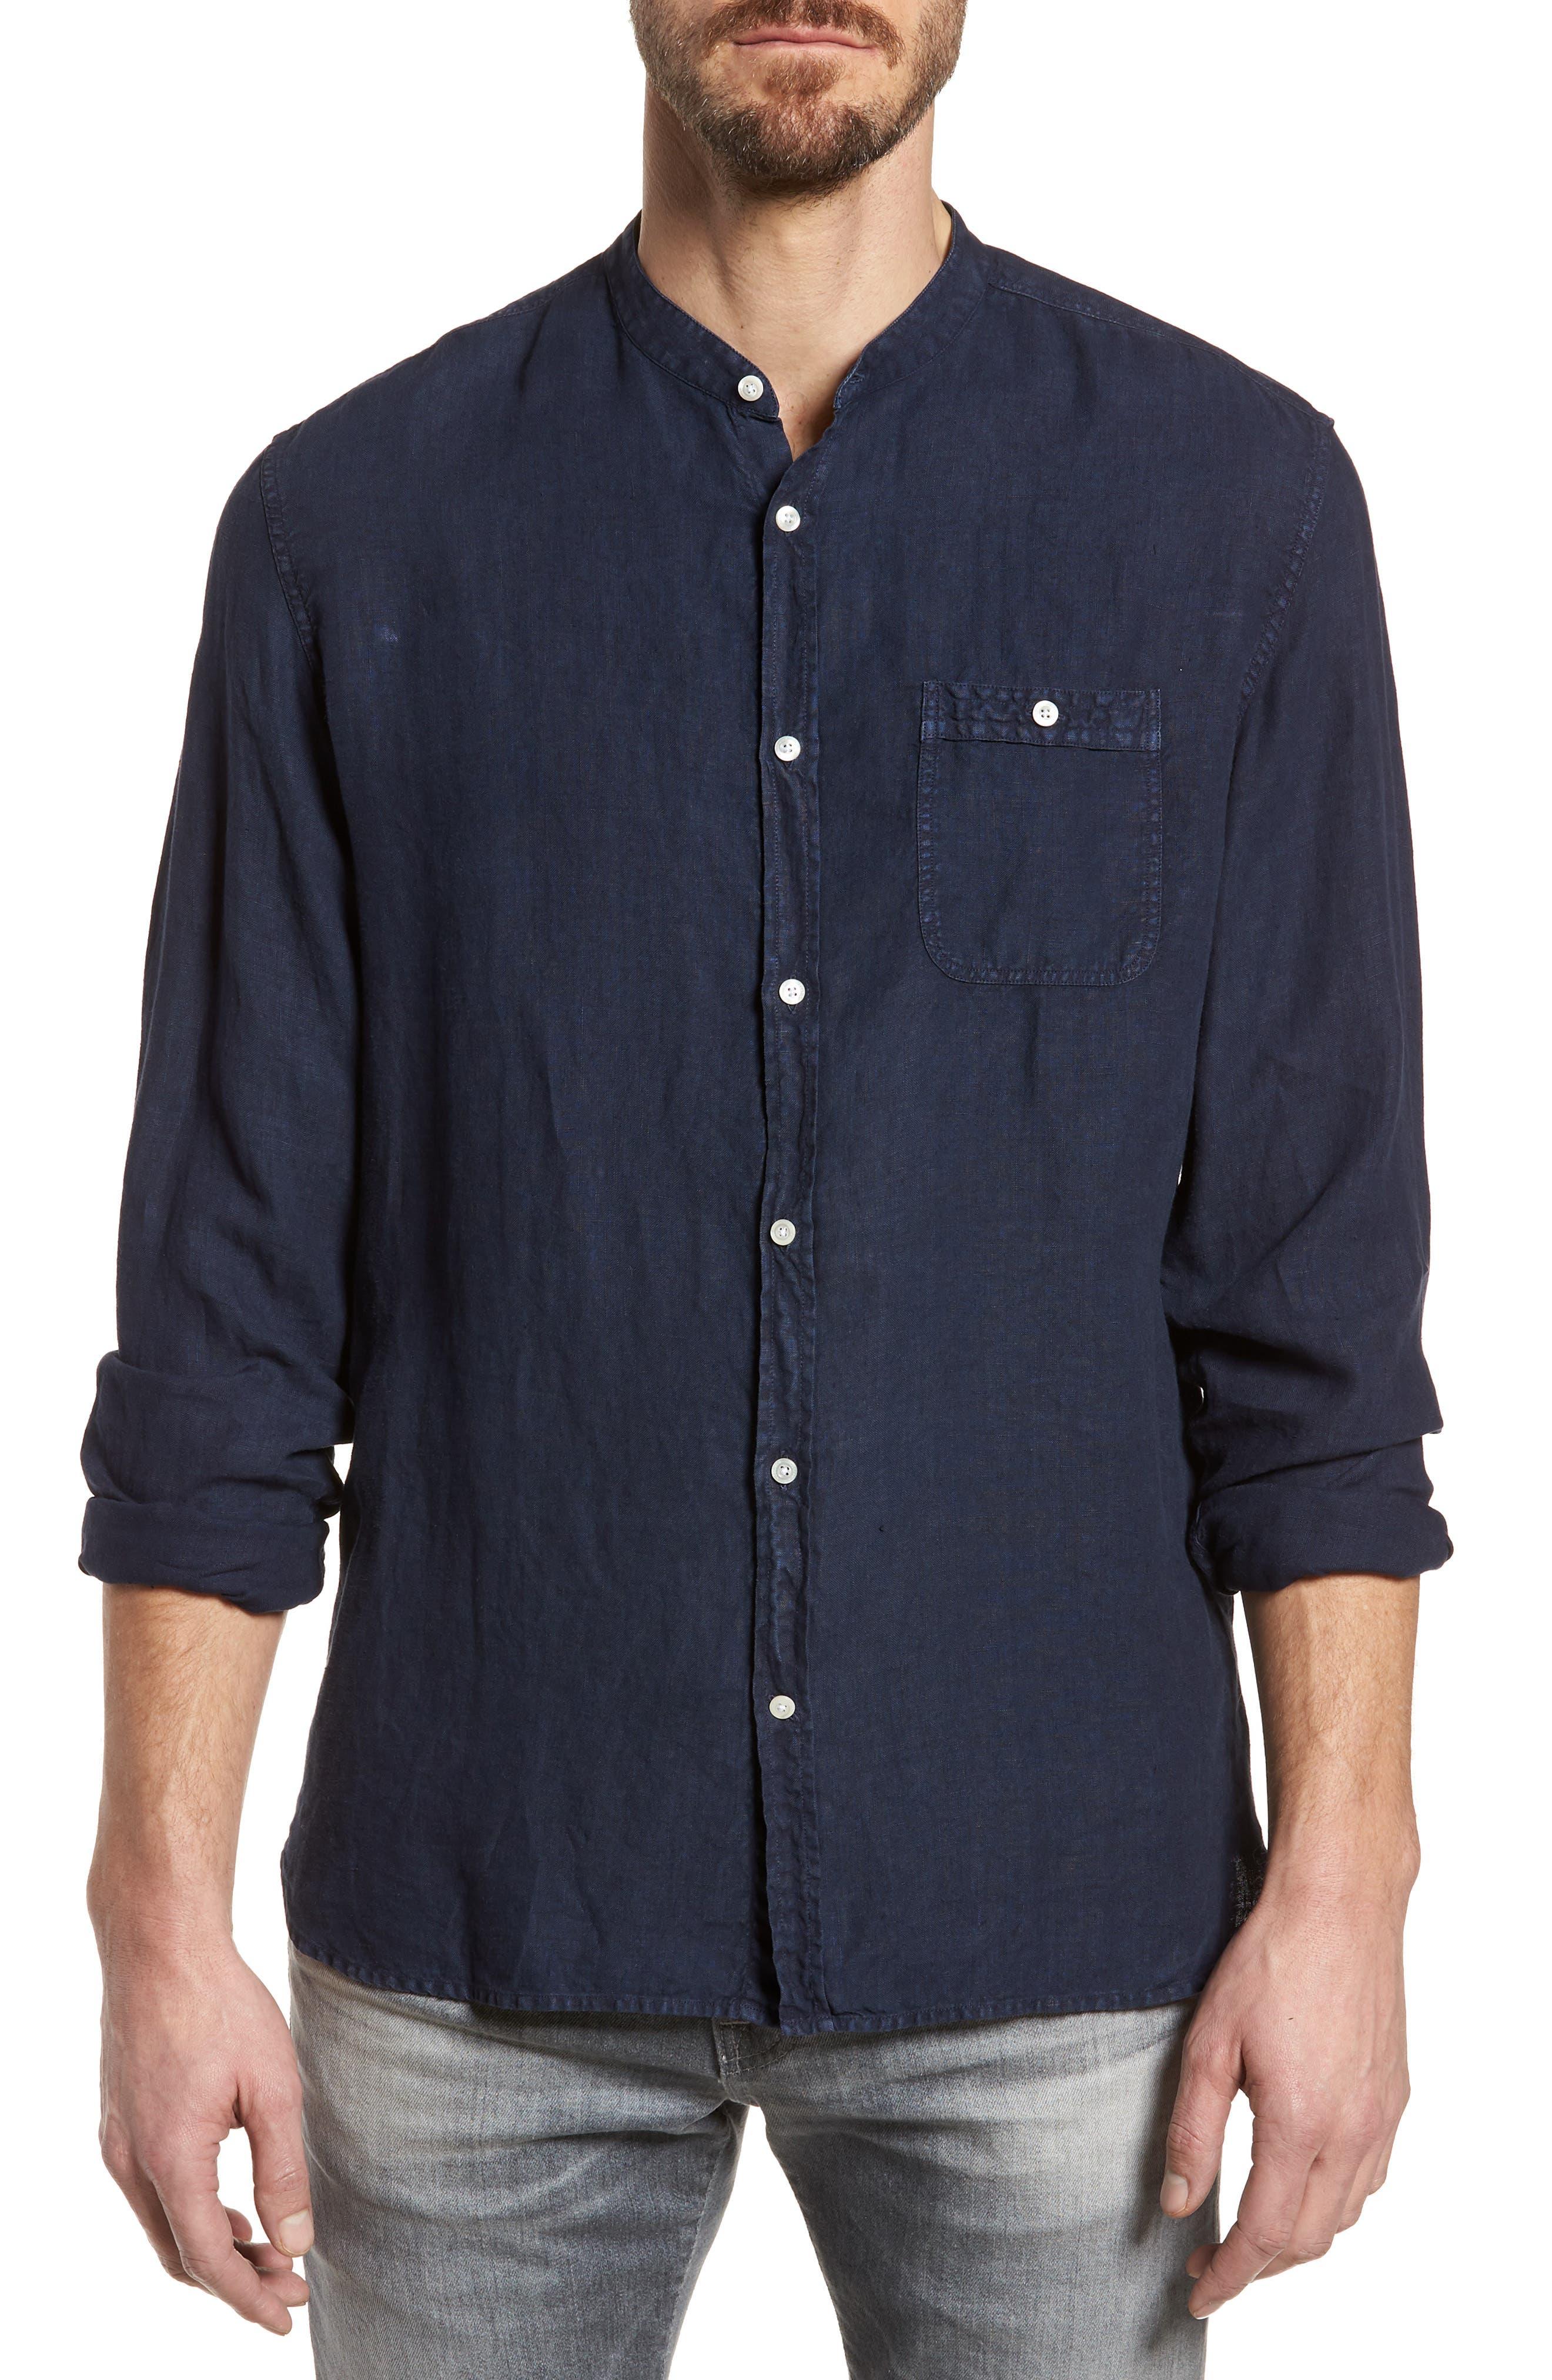 & Bros. Regular Fit Band Collar Linen Shirt,                             Main thumbnail 1, color,                             Mood Indigo